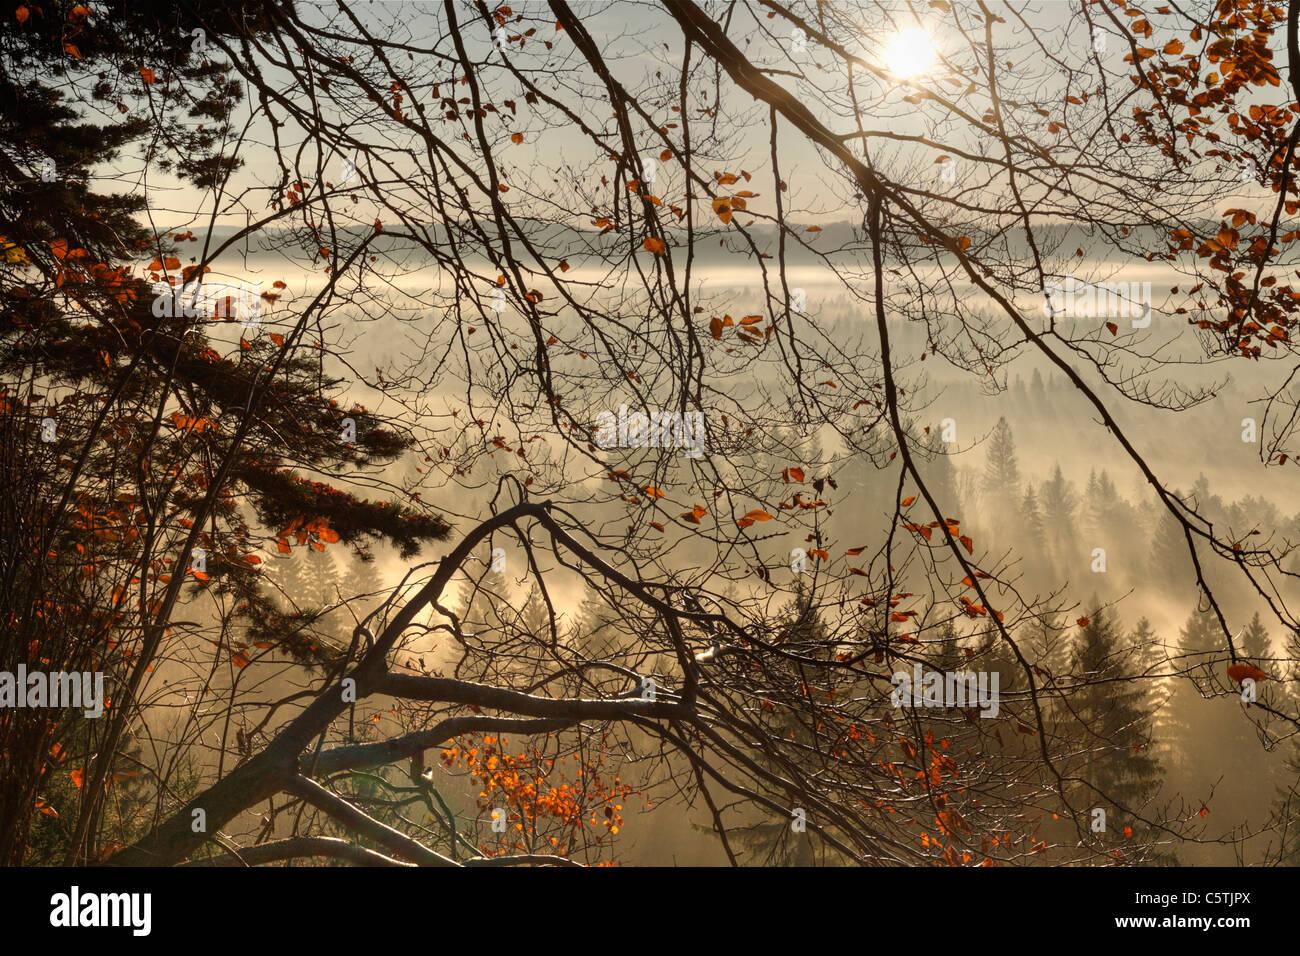 Germany, Bavaria, Upper Bavaria, View of pupplinger au near wolfratshausen in morning - Stock Image